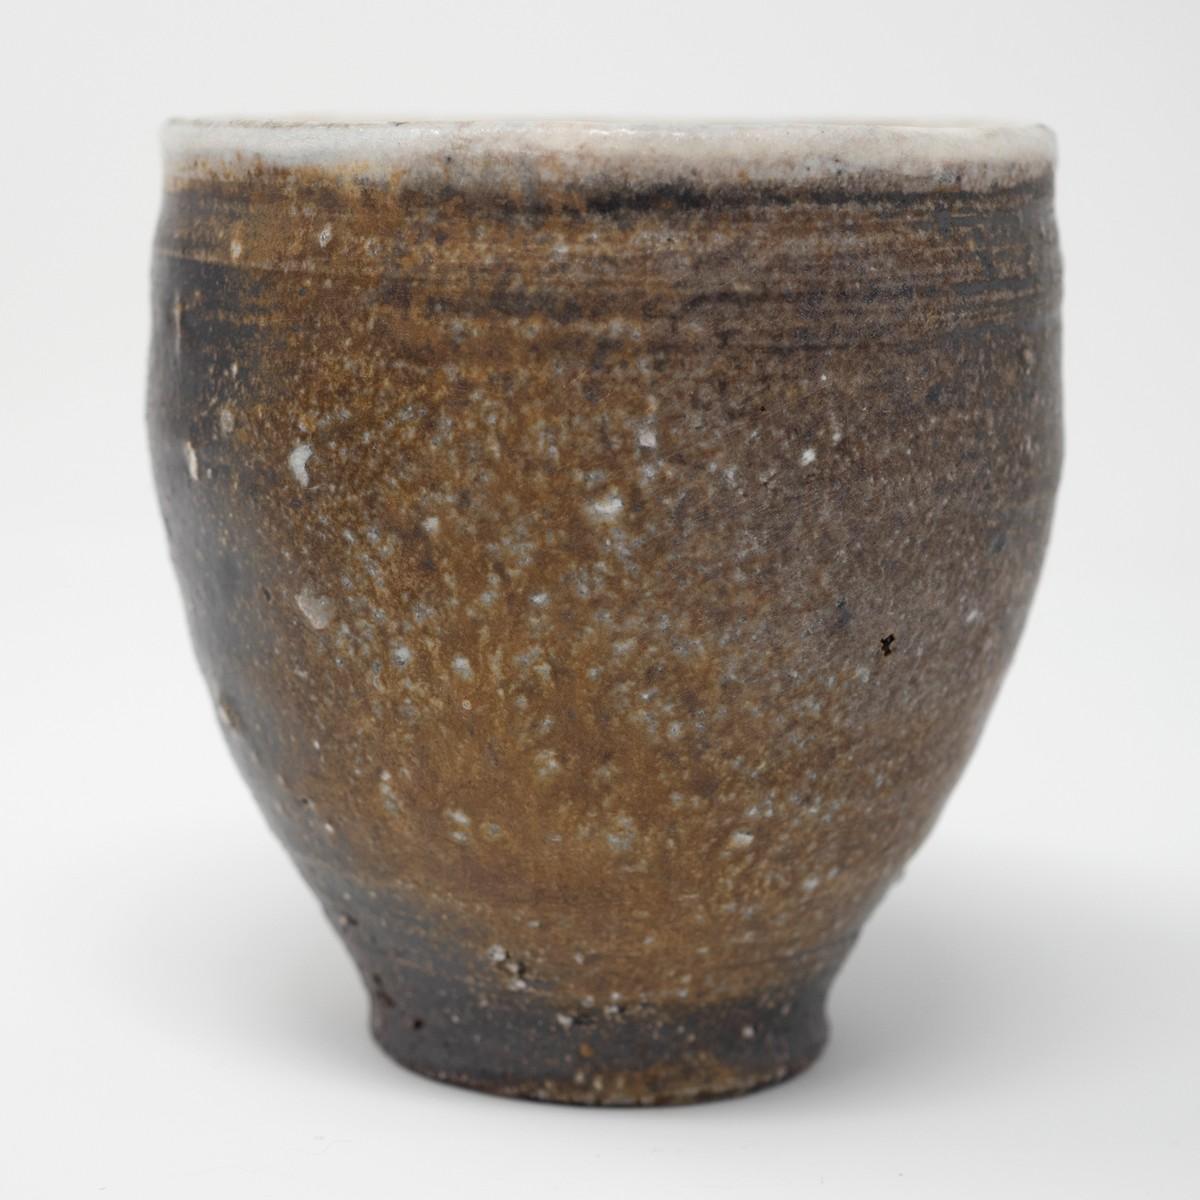 Photo of Raw Earth Pot